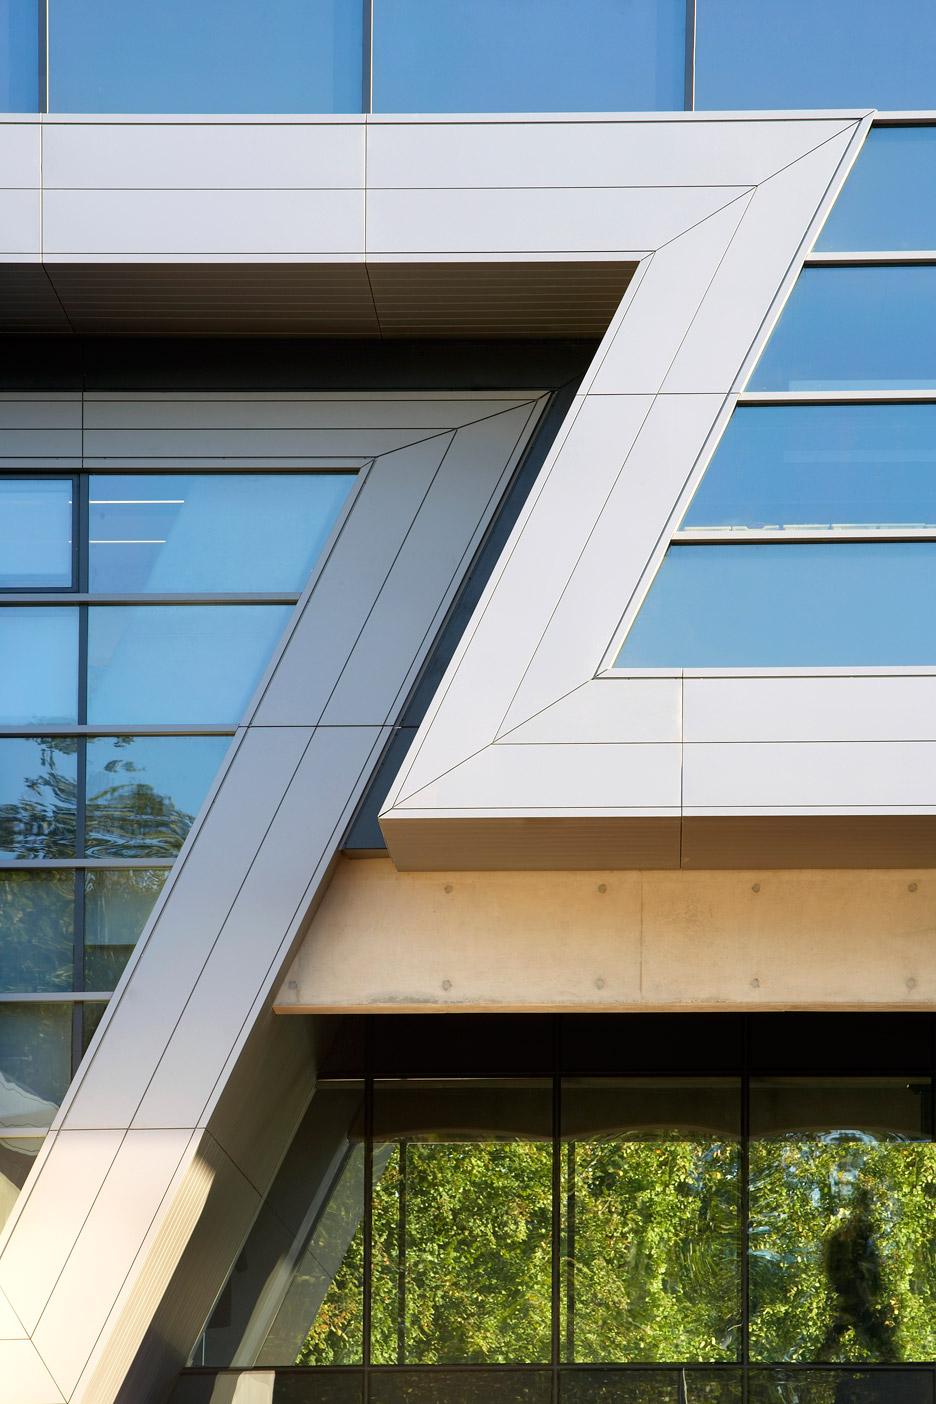 zaha-hadid-key-architecture-projects-photography-hufton-crow_dezeen_936_1